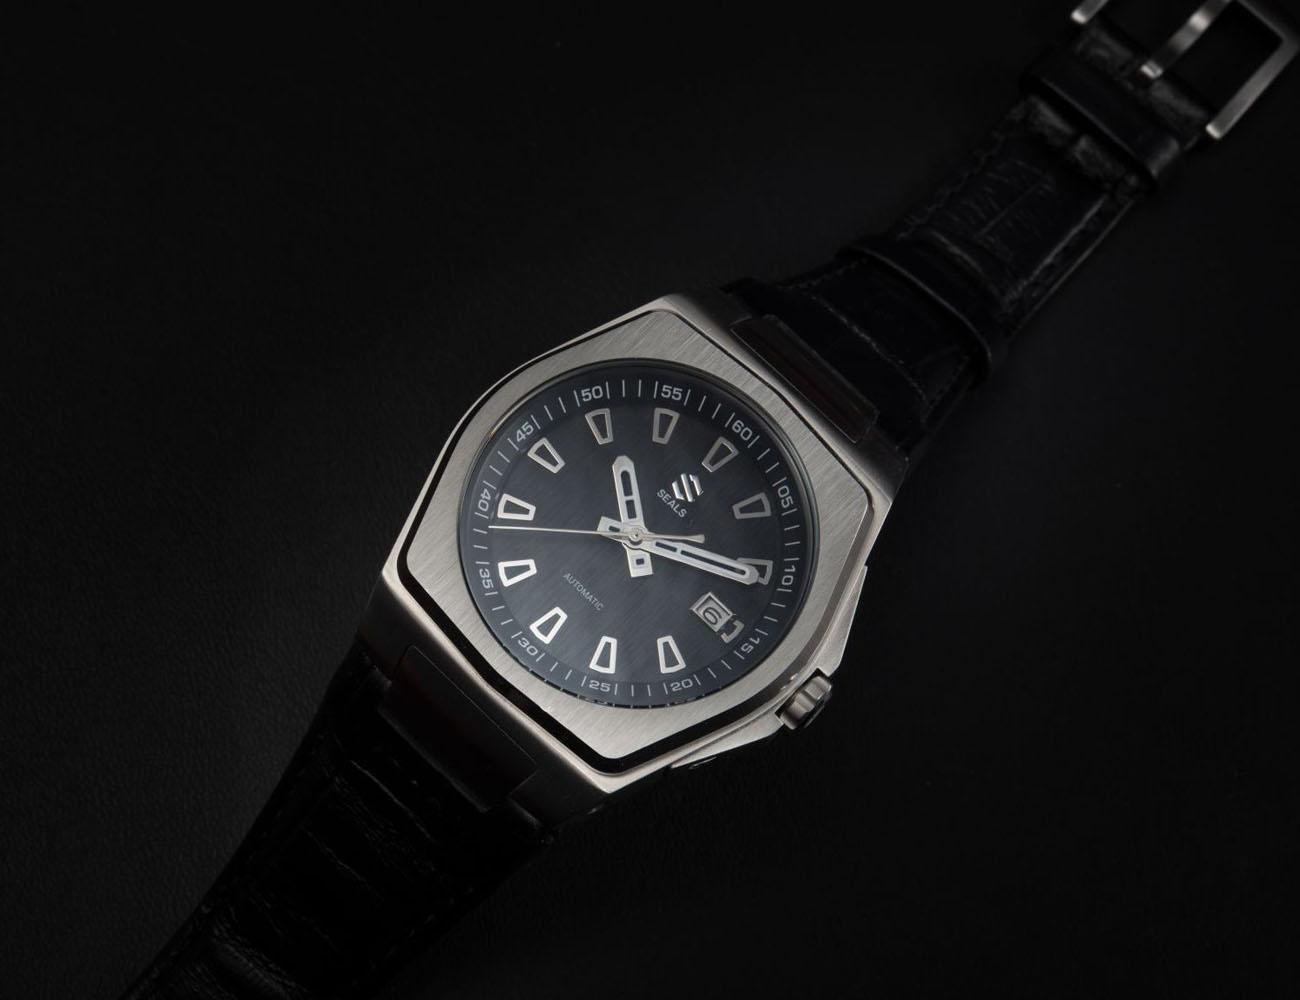 Seals Watch Company – Elegant Automatic Wrist Watches